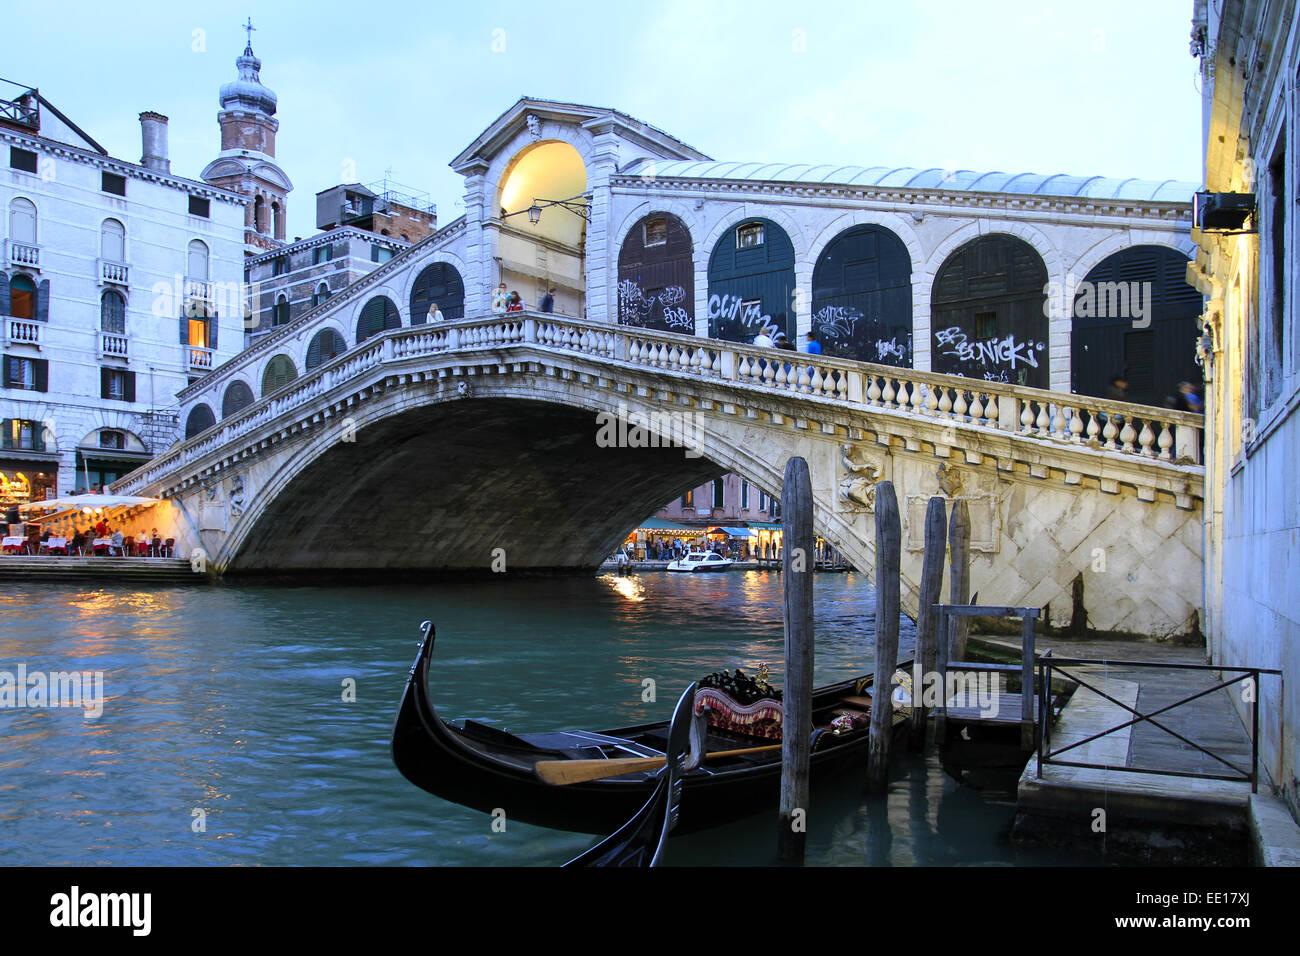 Canale Grande, Rialto Bruecke in Venedig, Italien - Stock Image